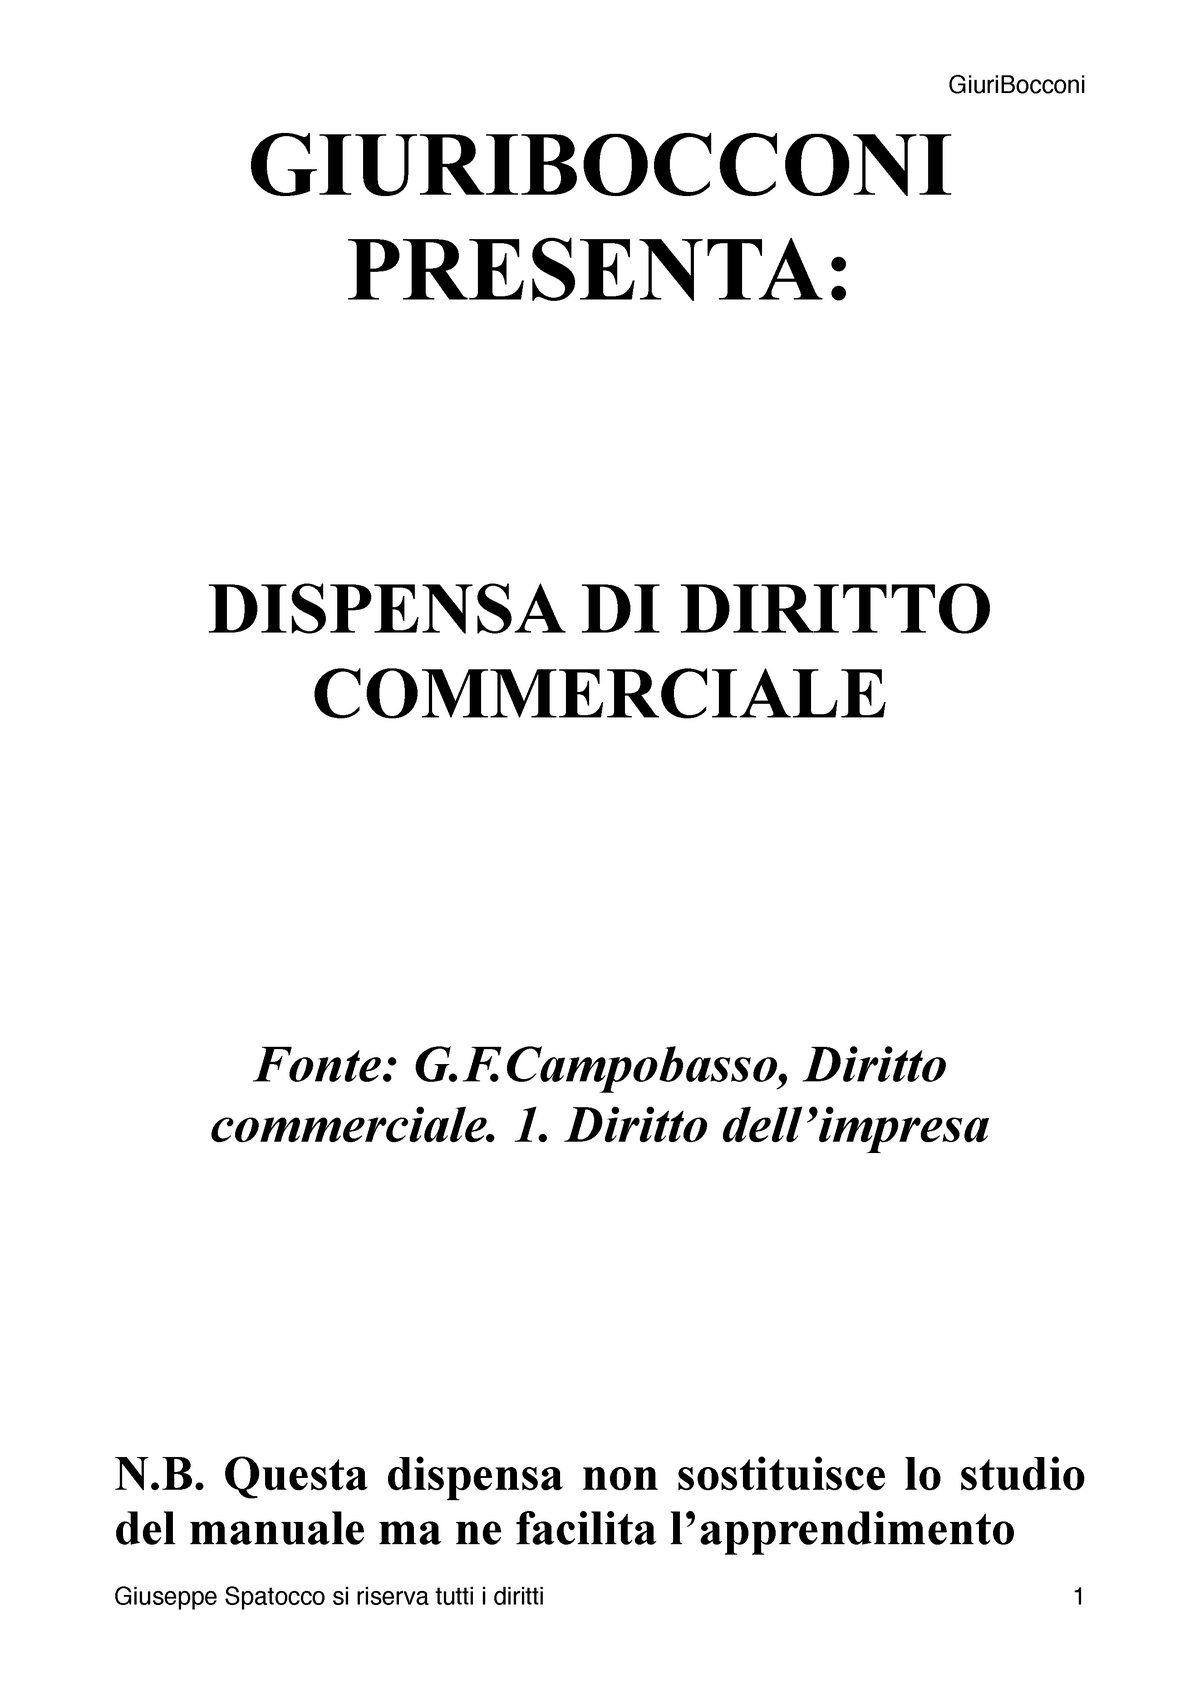 Dispensa commerciale vol1 - 50021 - UniBocconi - StuDocu